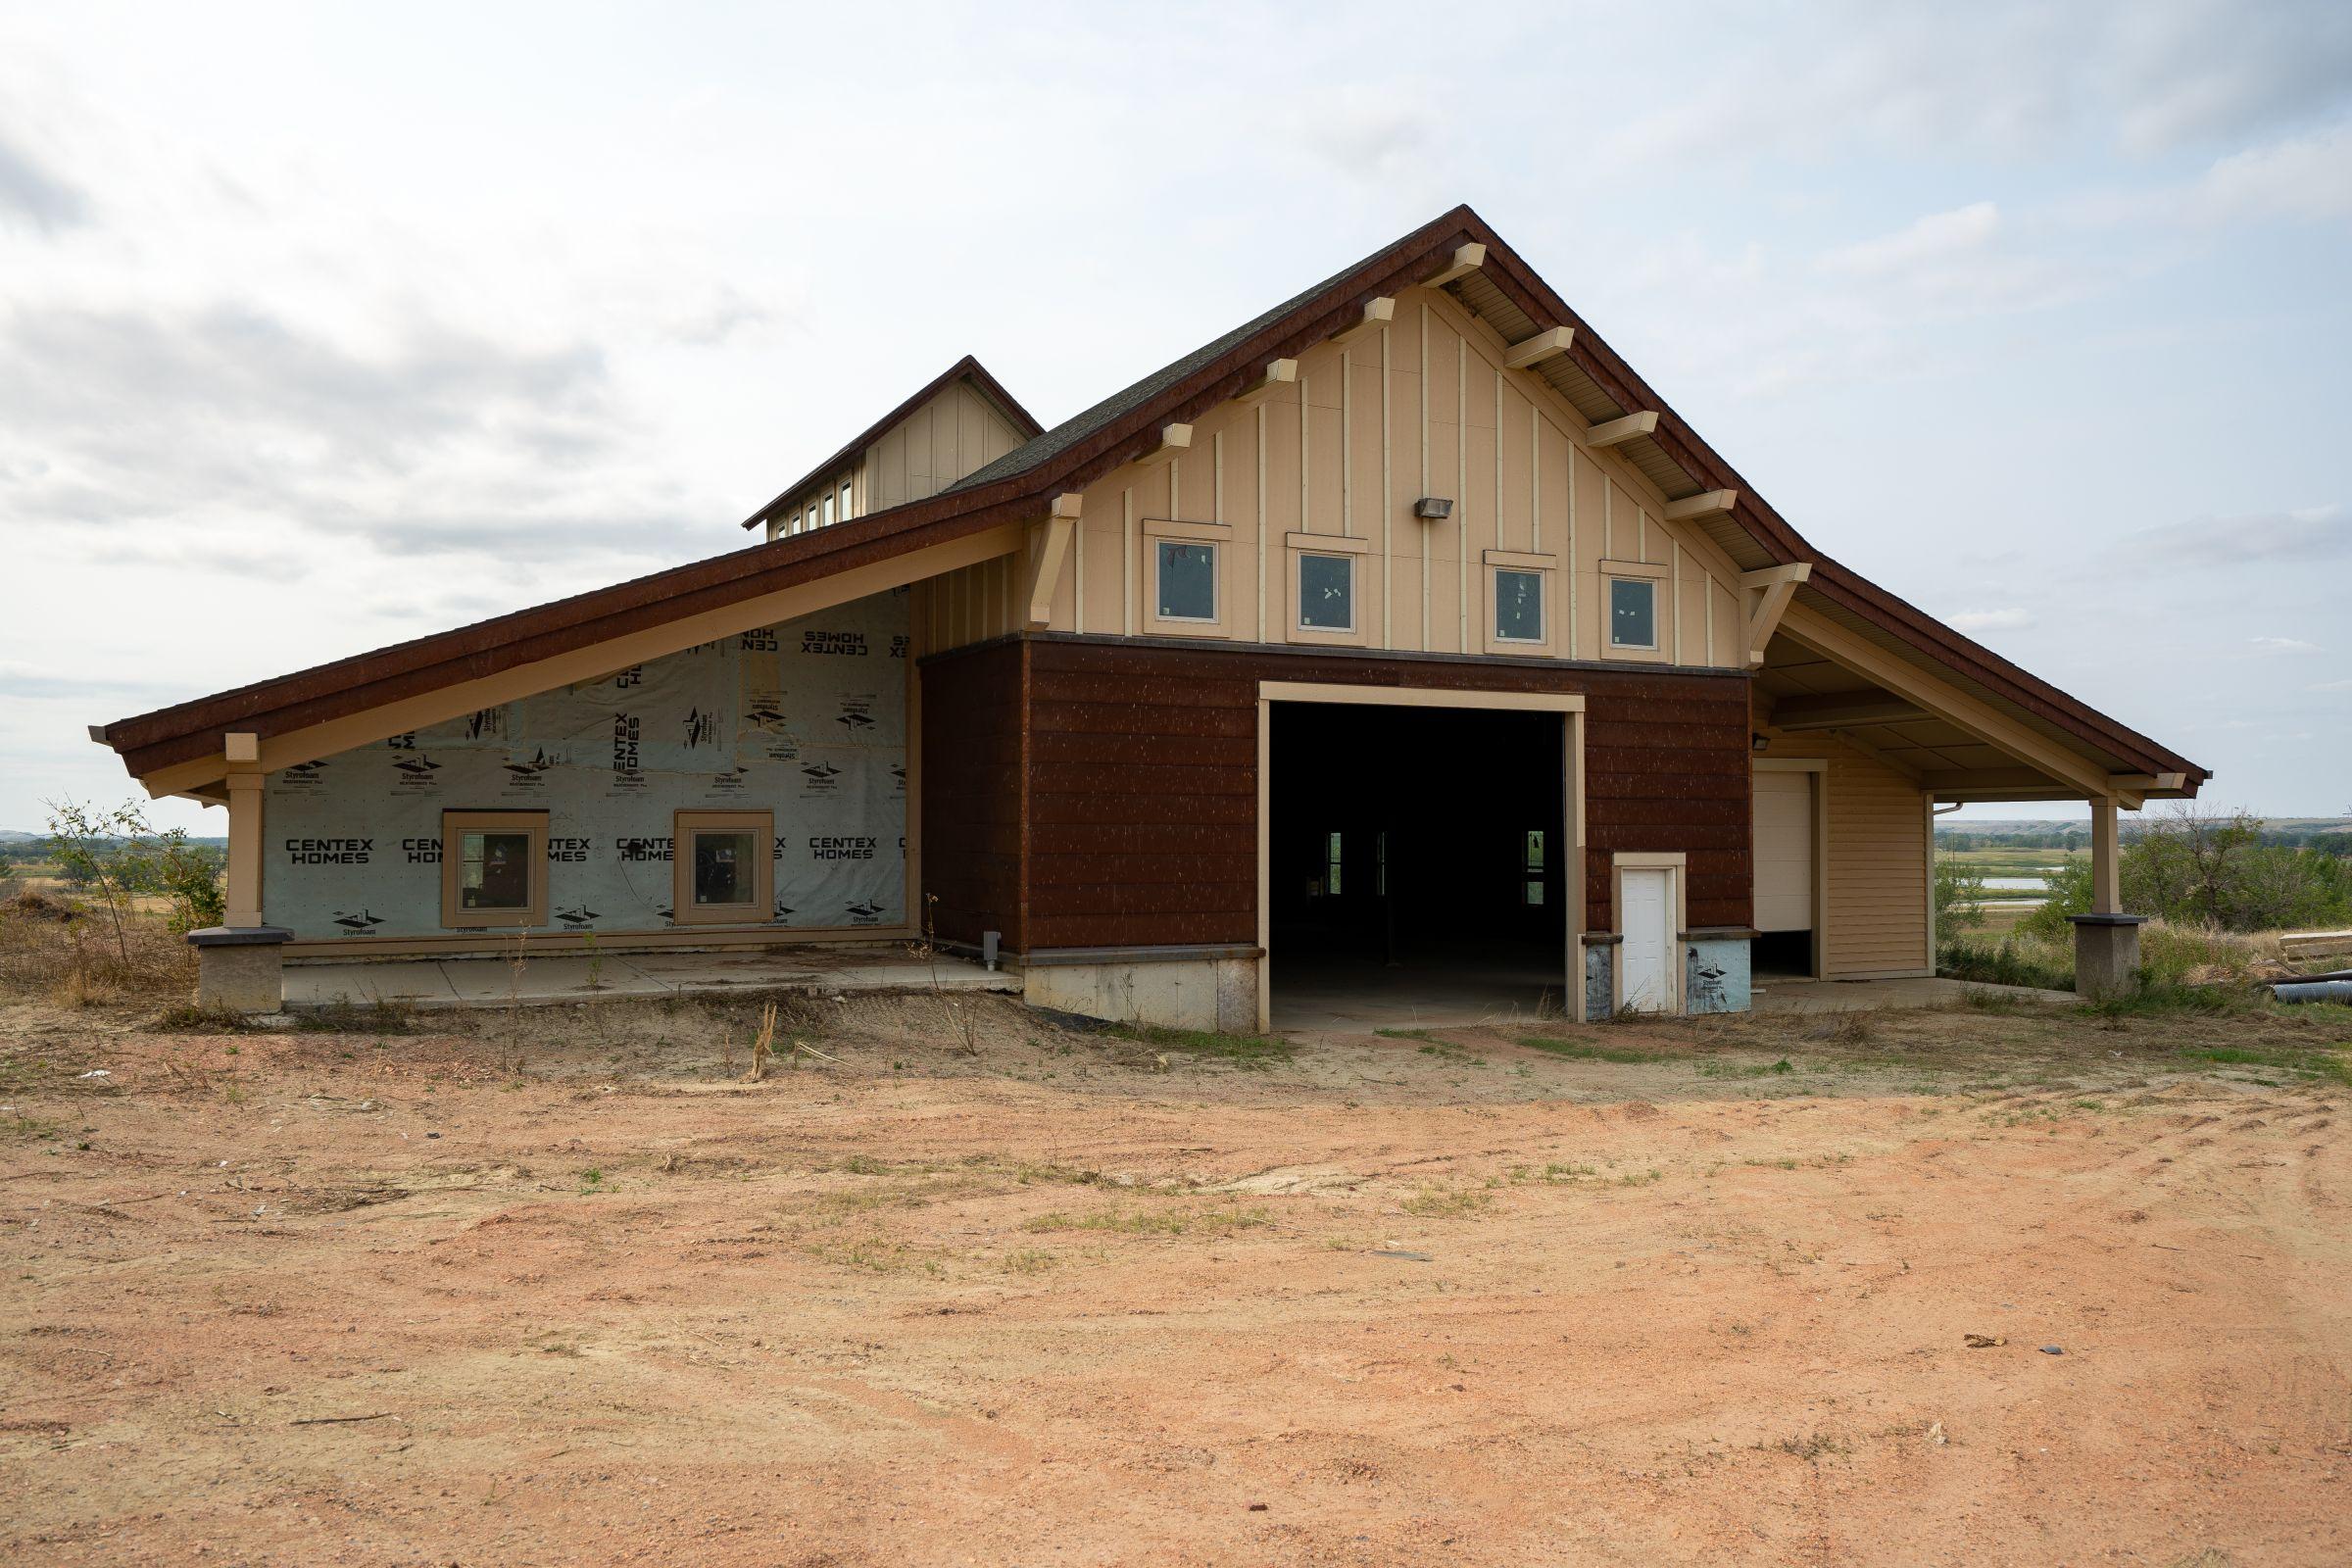 auctions-land-mckenzie-county-north-dakota-270-acres-listing-number-15735-3-2021-09-10-135359.jpeg